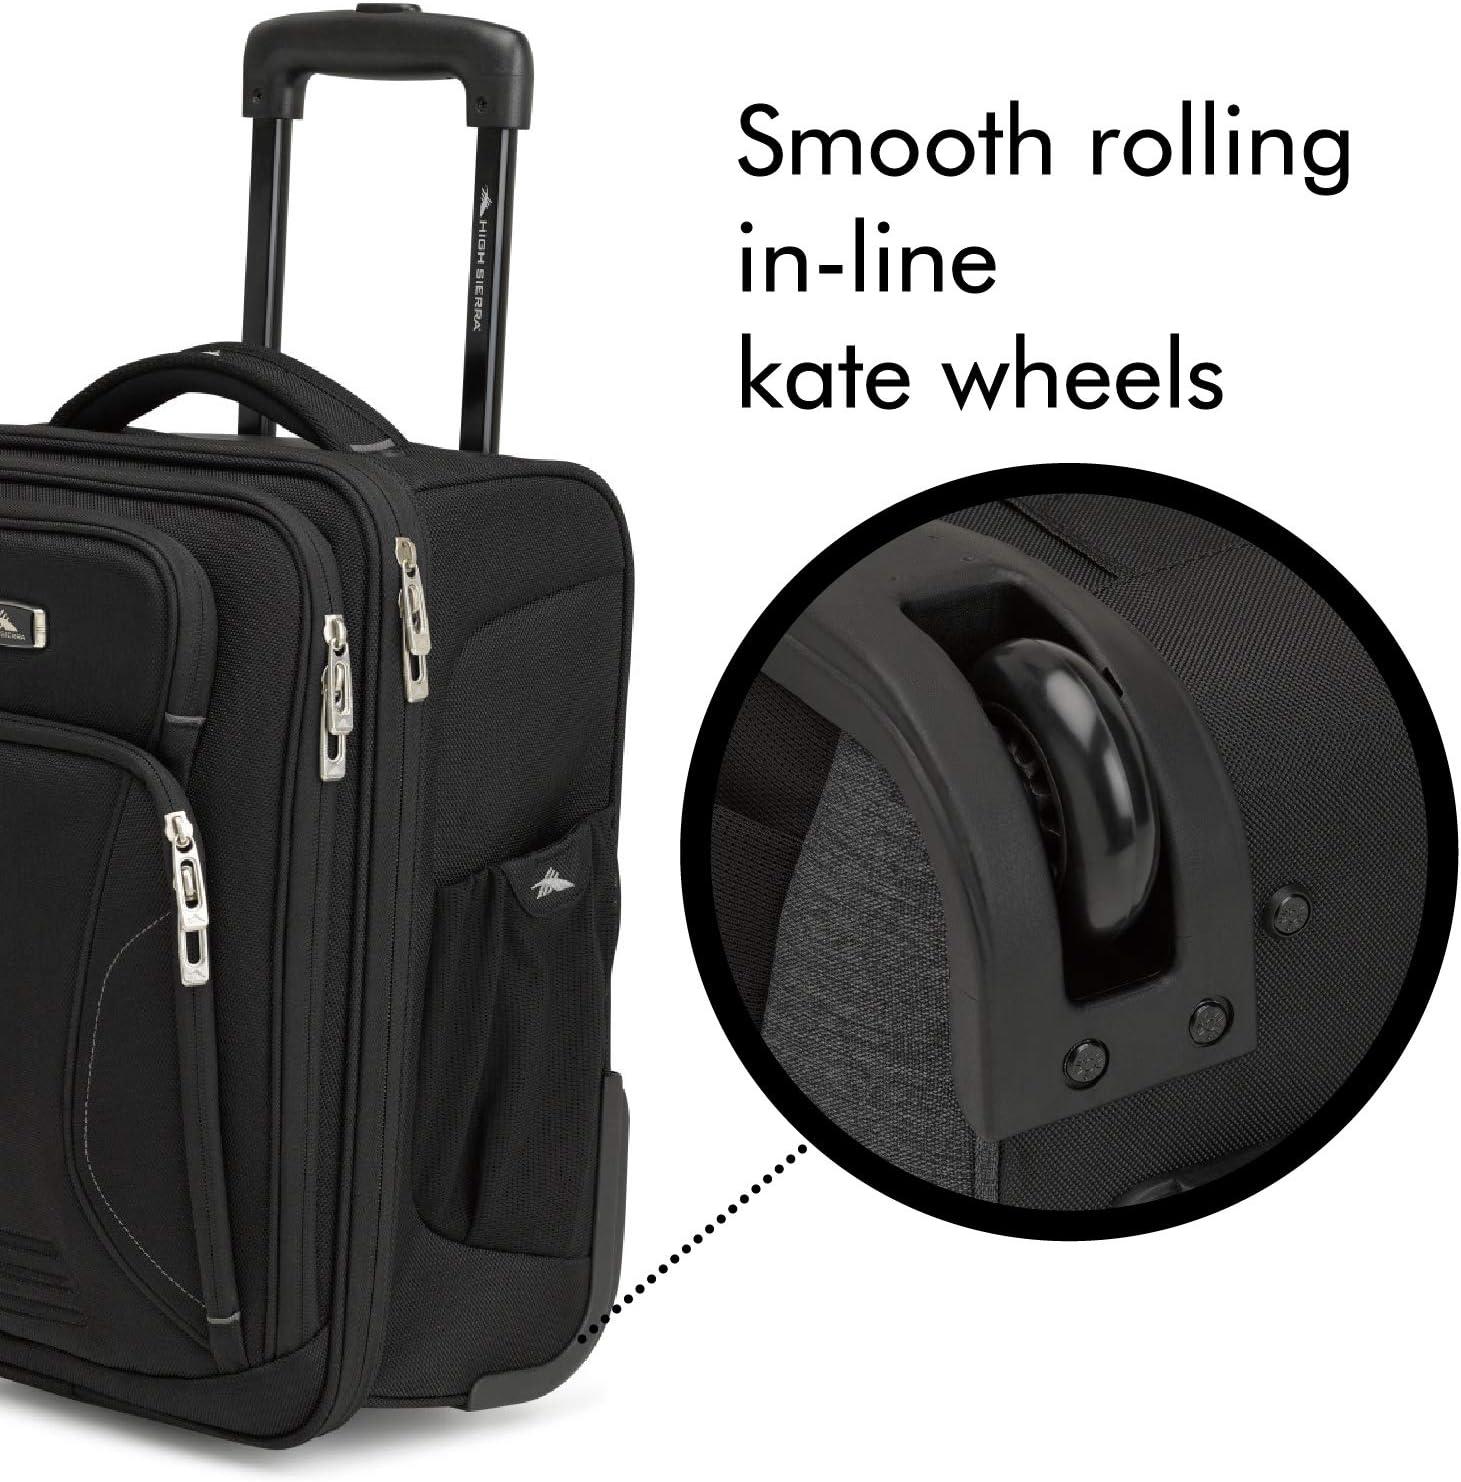 Amazon.com: High Sierra Endeavor - Maleta con ruedas para ...